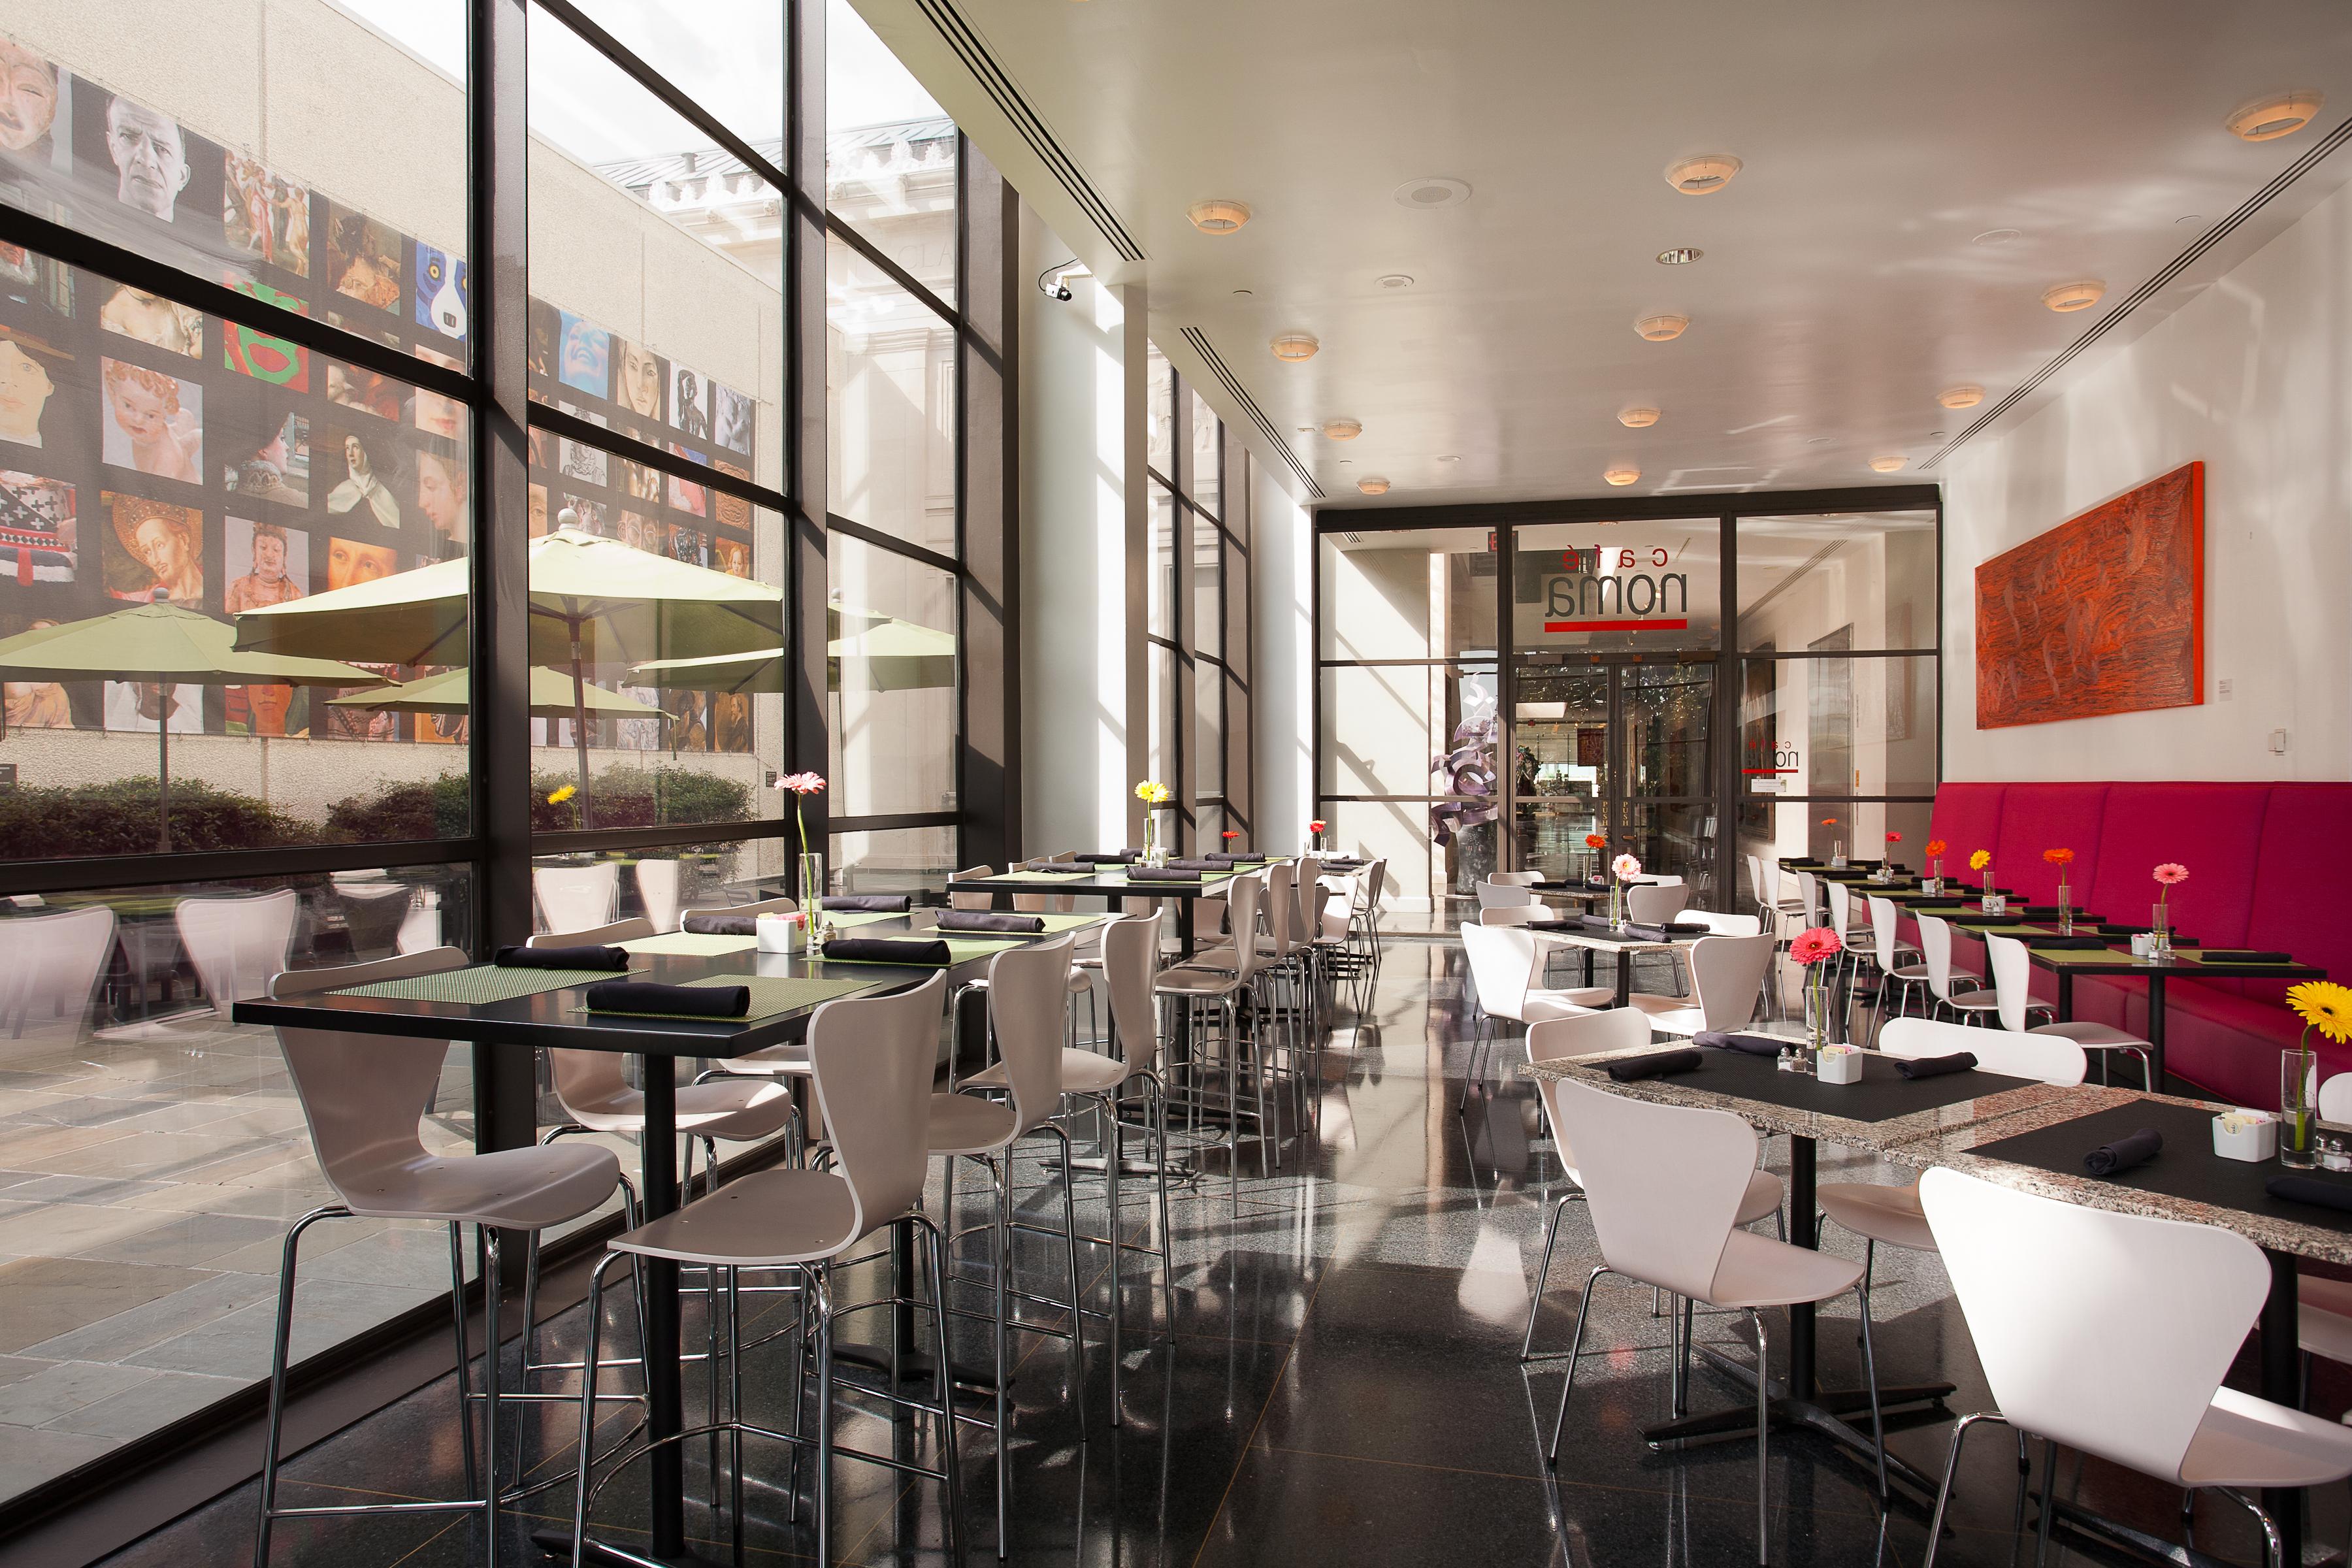 The ralph brennan restaurant group